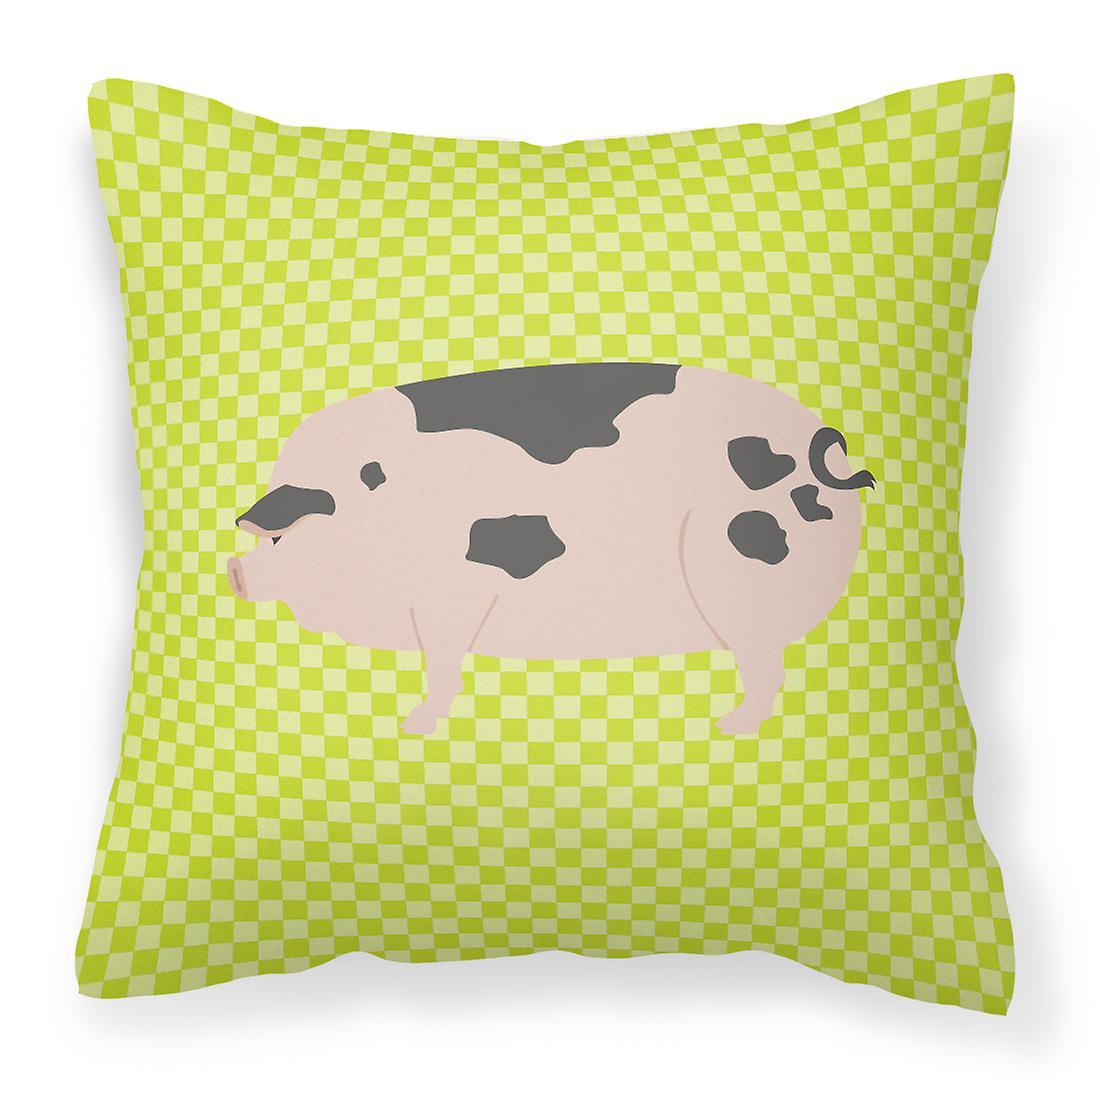 Oreiller Cochon Tissu Décoratif Gloucester Place Vert Vieux Okn0Pw